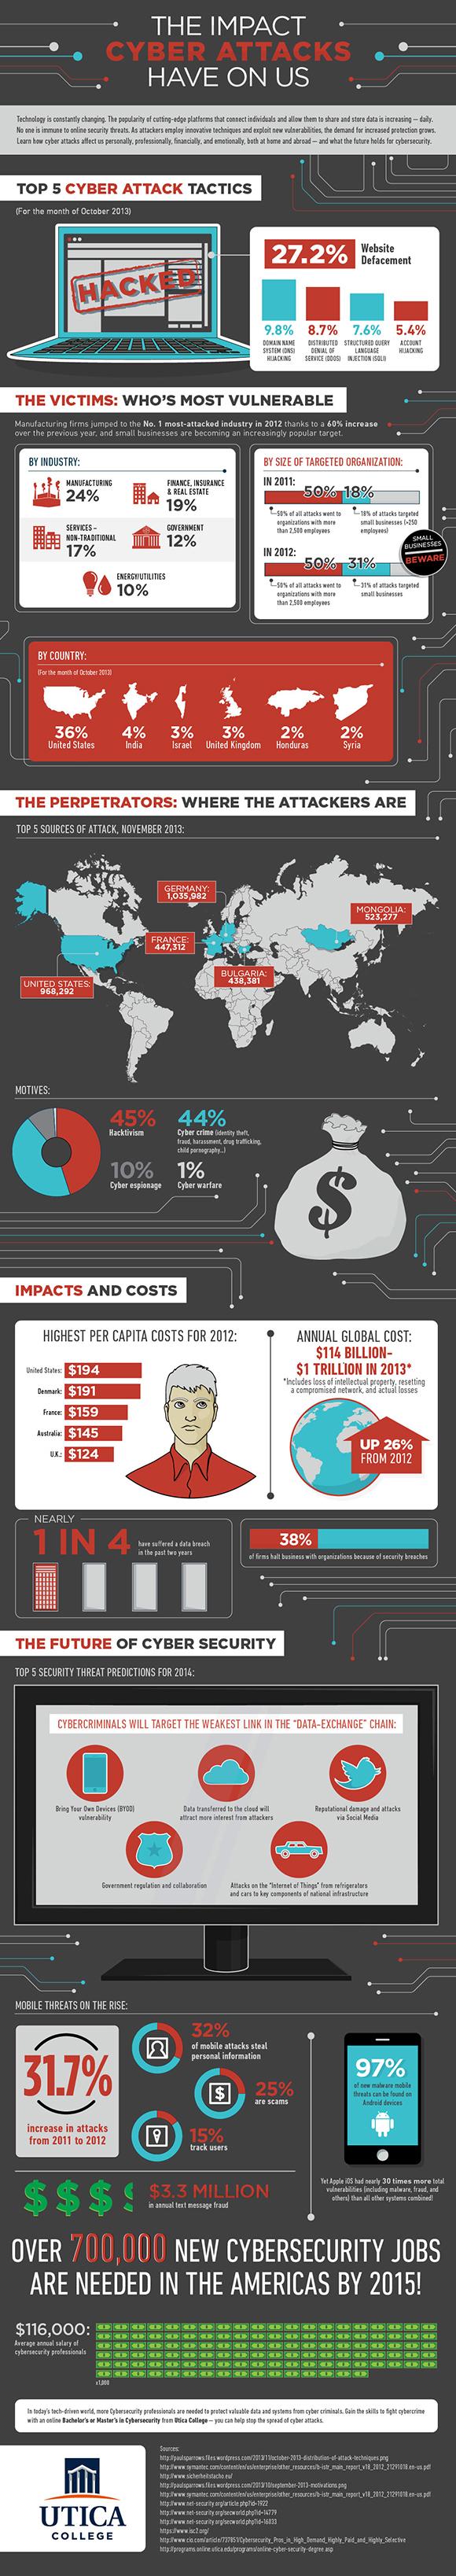 El impacto de los ciberataques